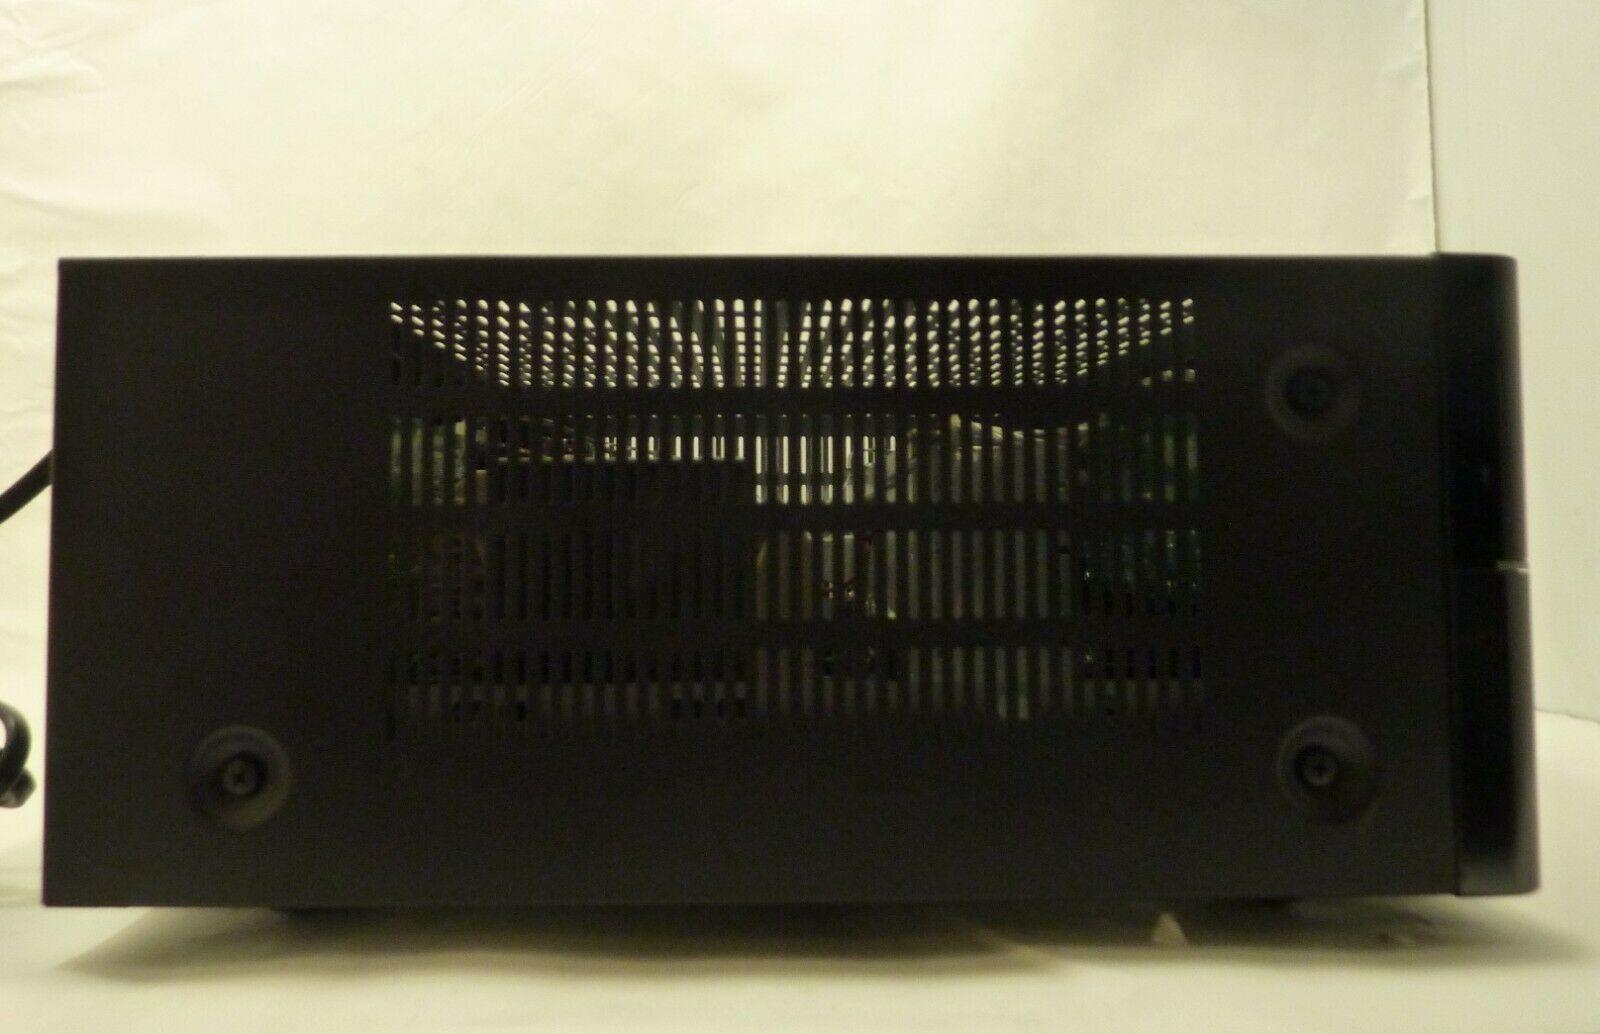 Harman Kardon HK 3390 Stereo Receiver